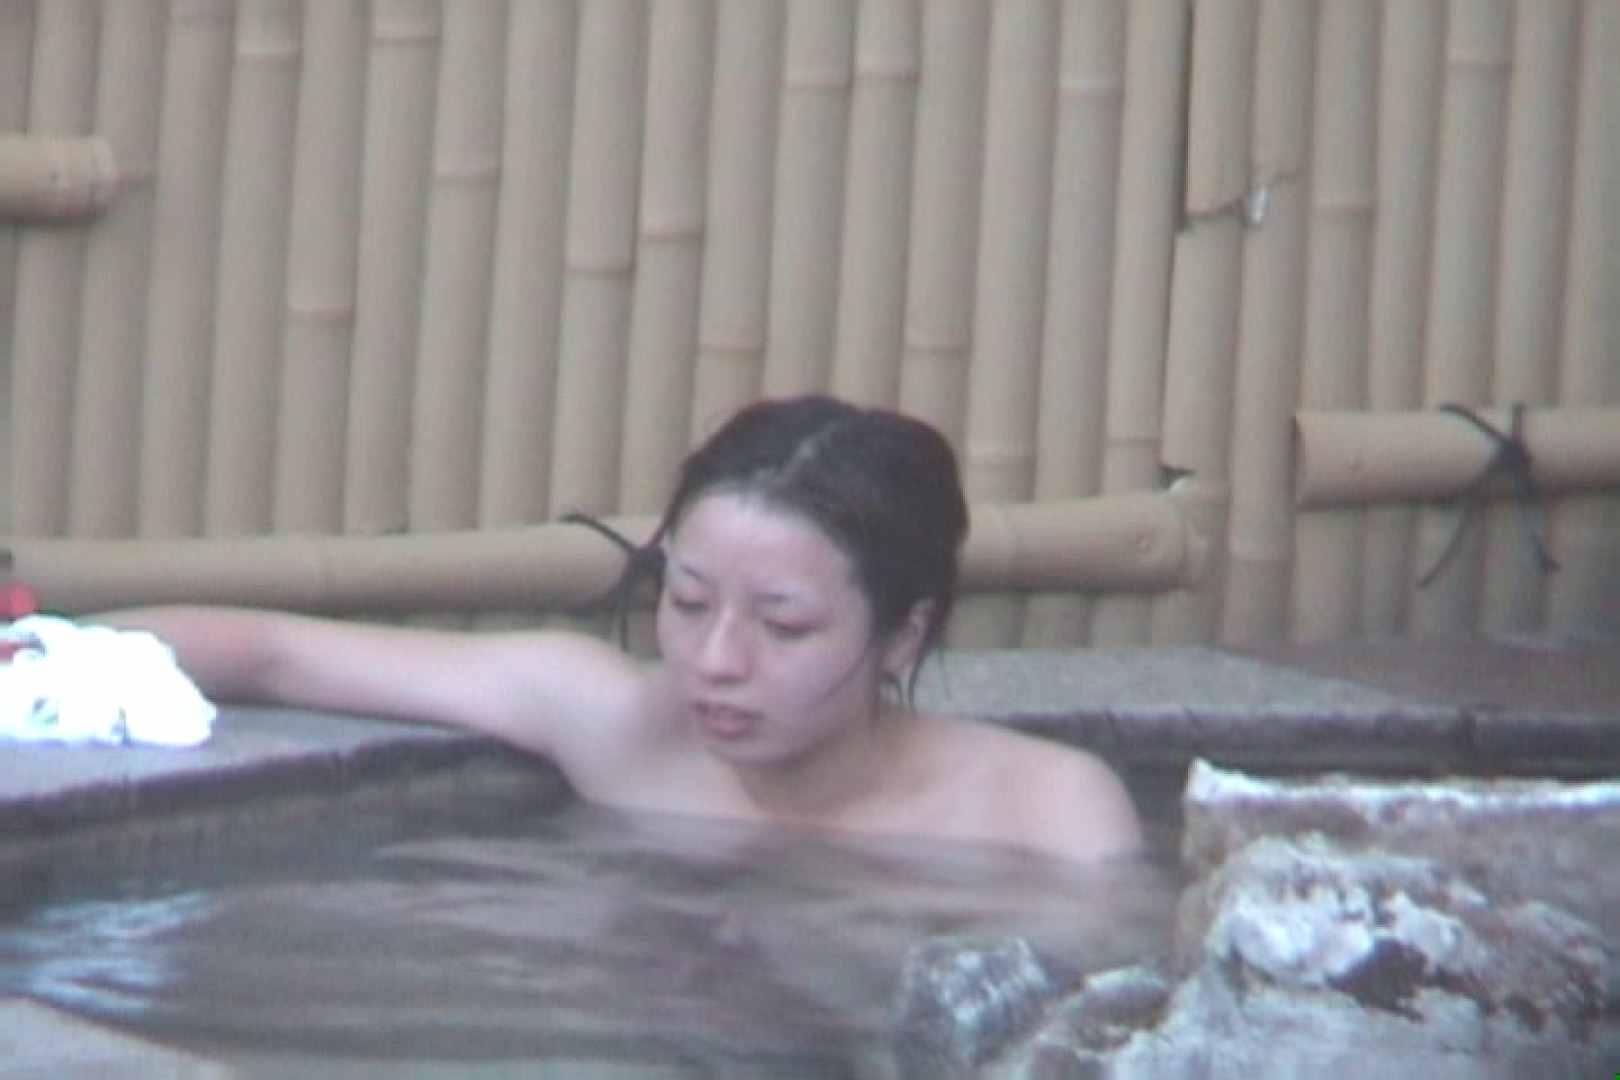 Aquaな露天風呂Vol.608 美しいOLの裸体 AV動画キャプチャ 95pic 56